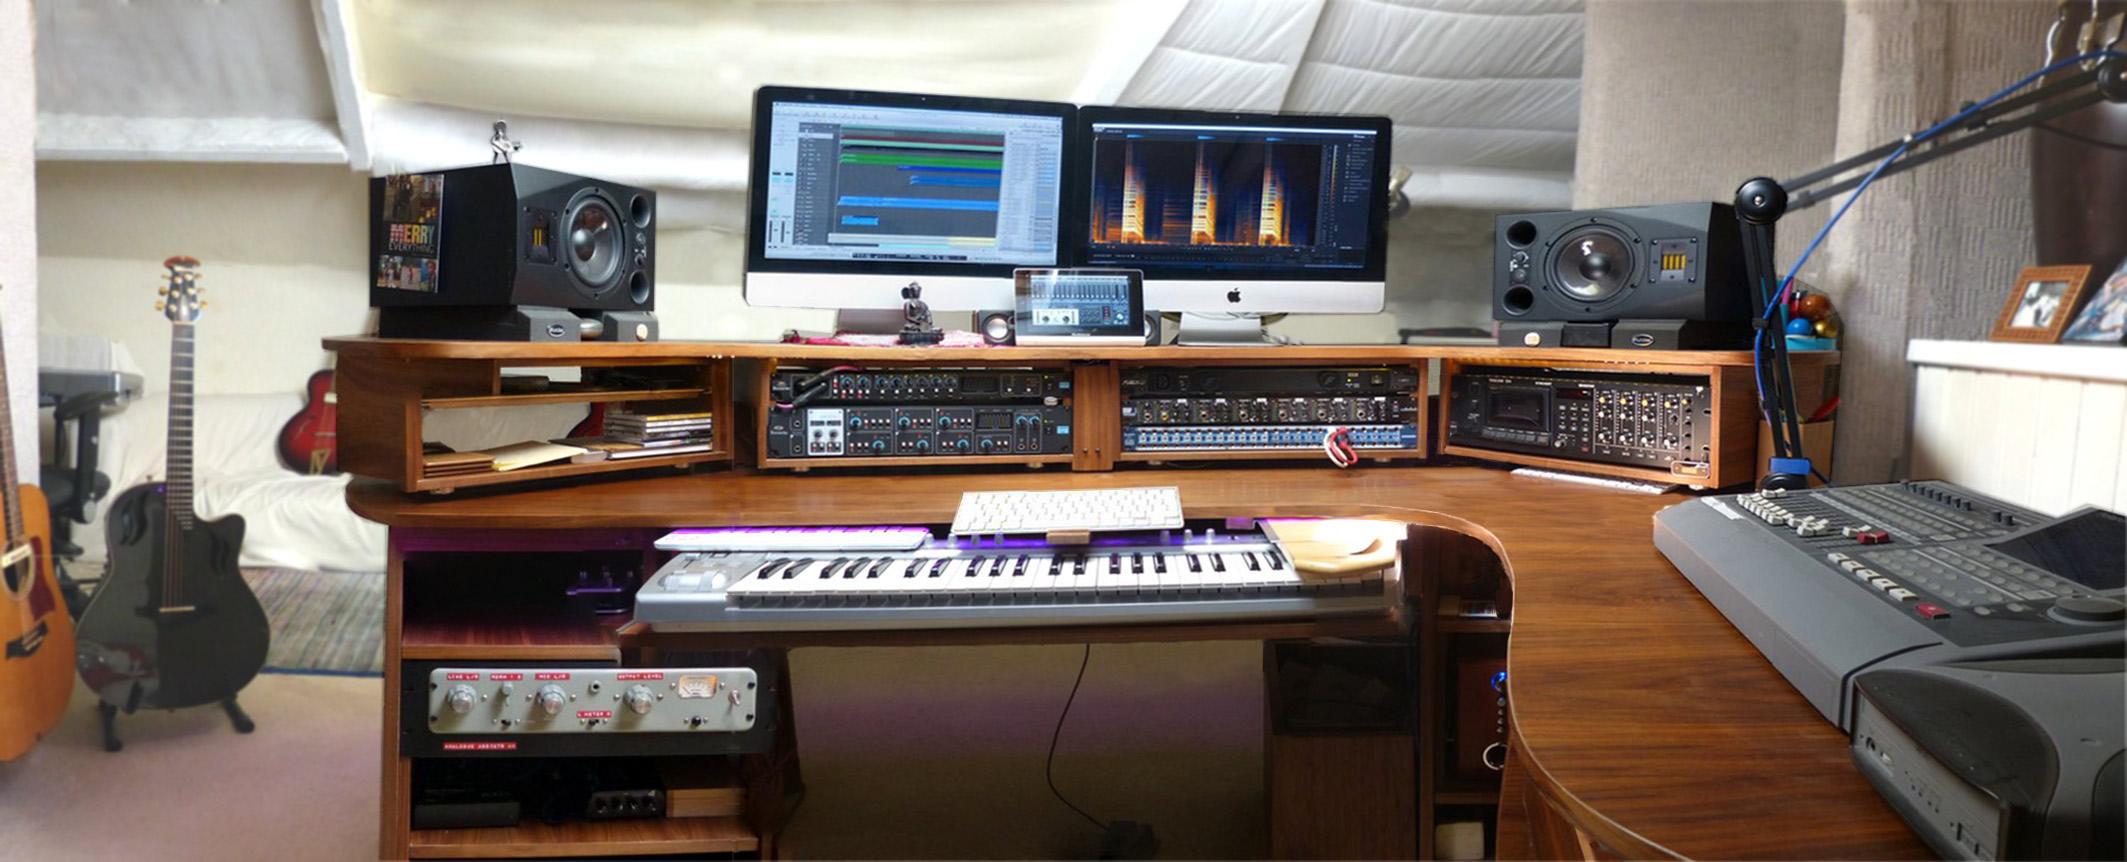 StudioPanorama